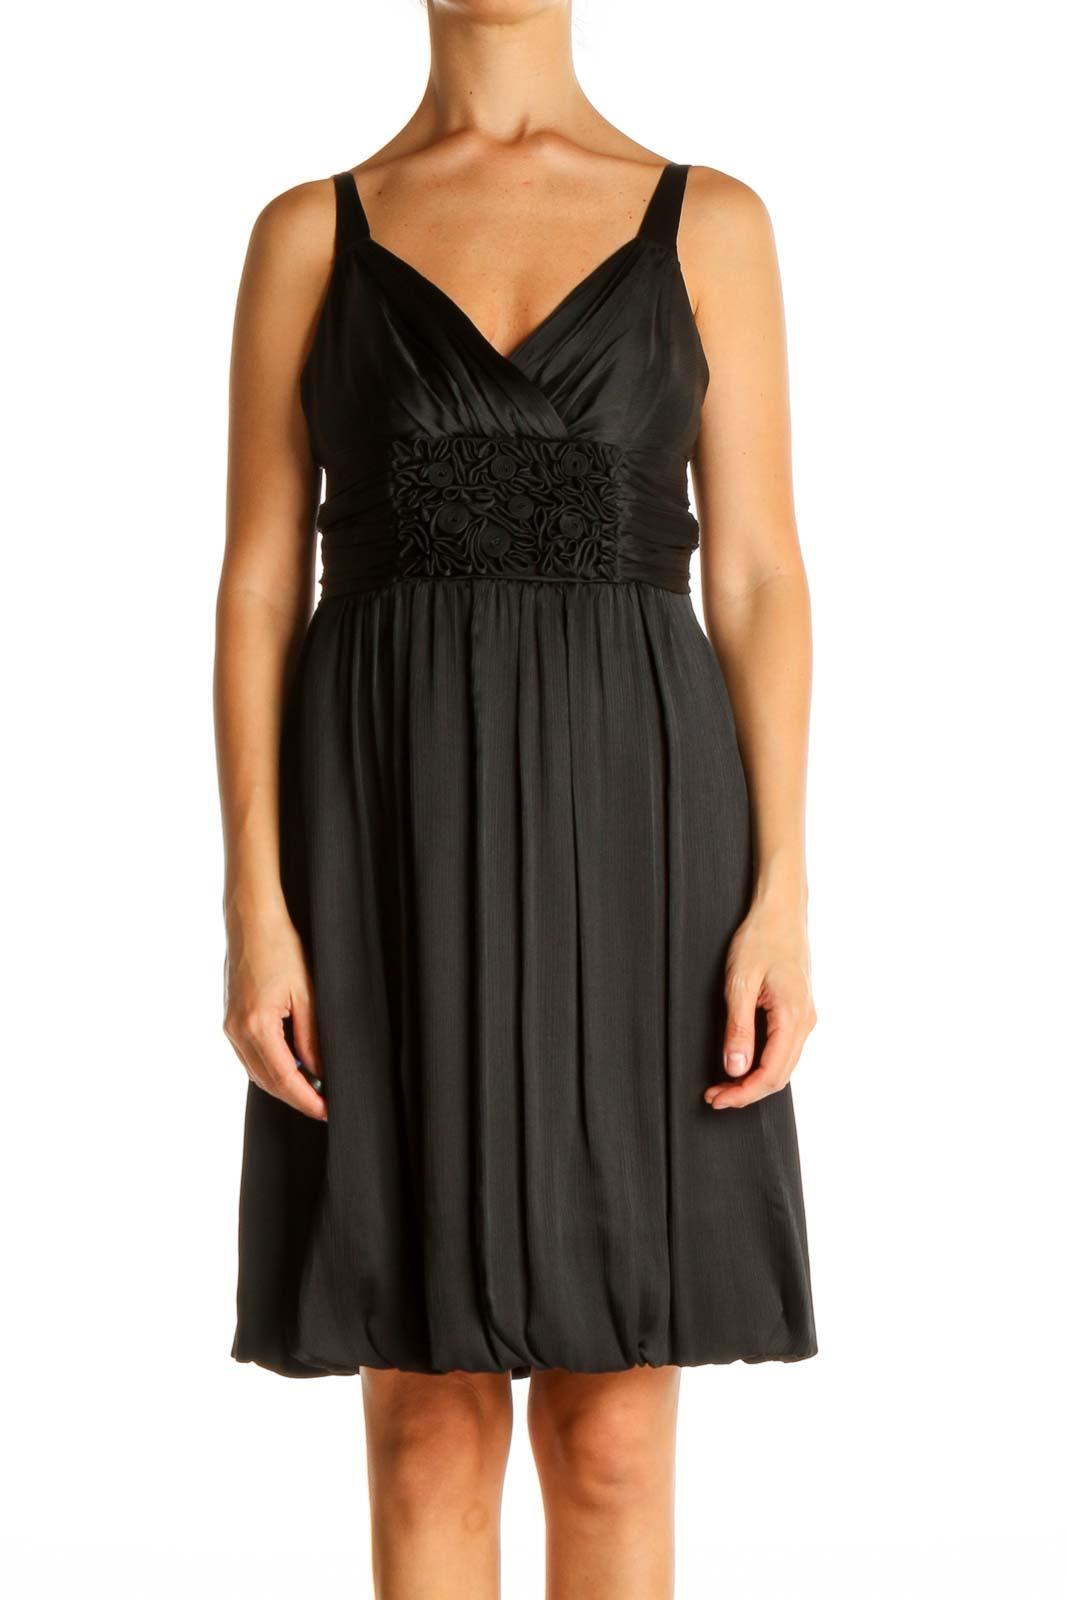 Black Solid Cocktail Fit & Flare Dress Front